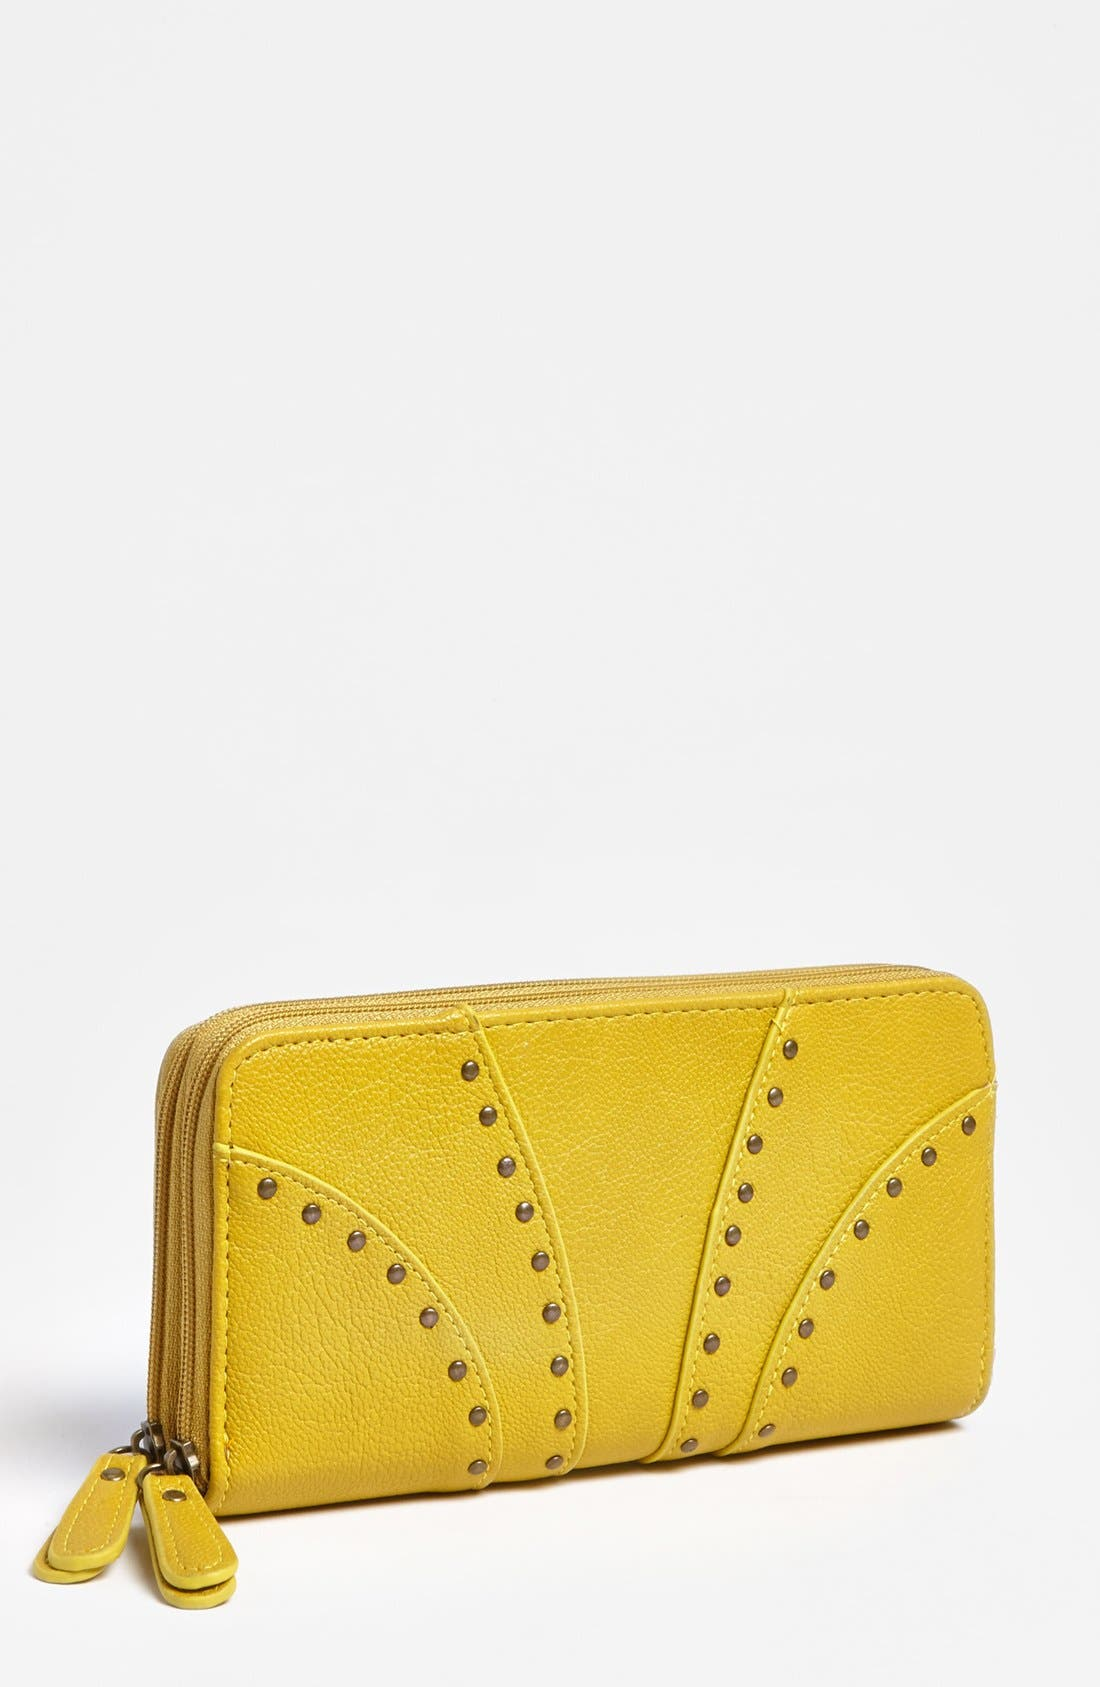 Main Image - Jessica Simpson 'Allie' Zip Around Faux Leather Wallet